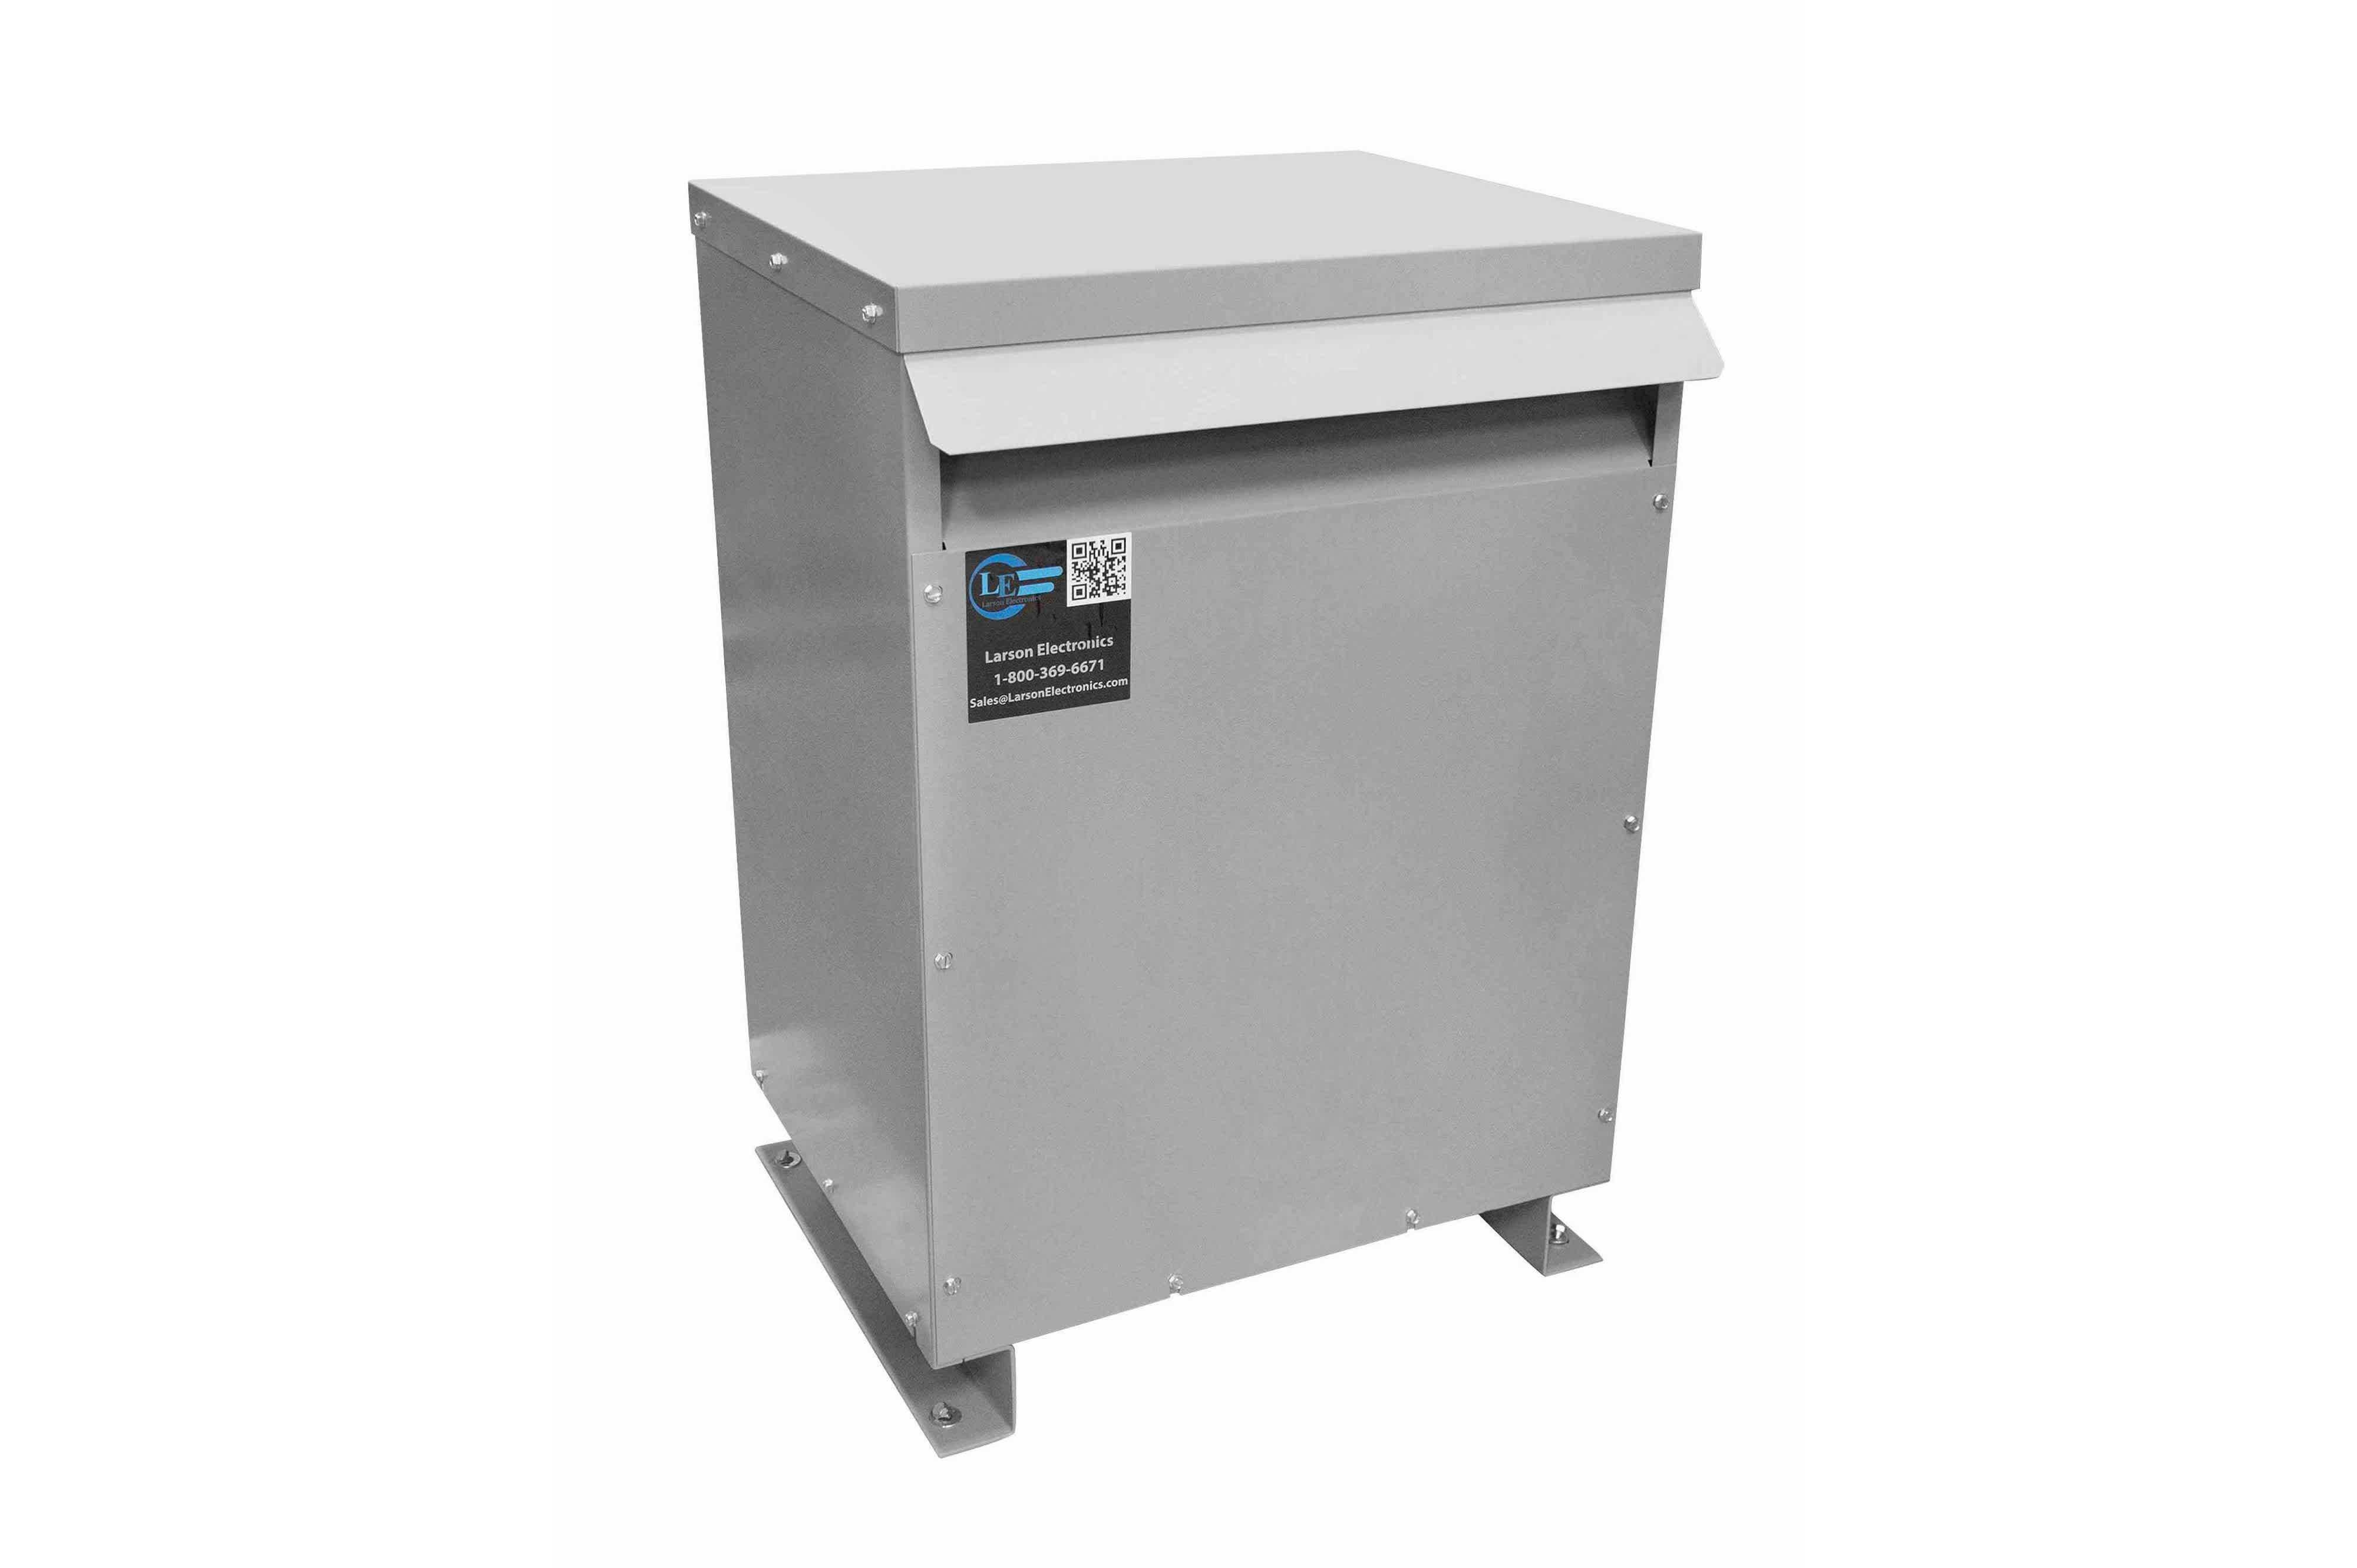 11 kVA 3PH Isolation Transformer, 460V Wye Primary, 600Y/347 Wye-N Secondary, N3R, Ventilated, 60 Hz